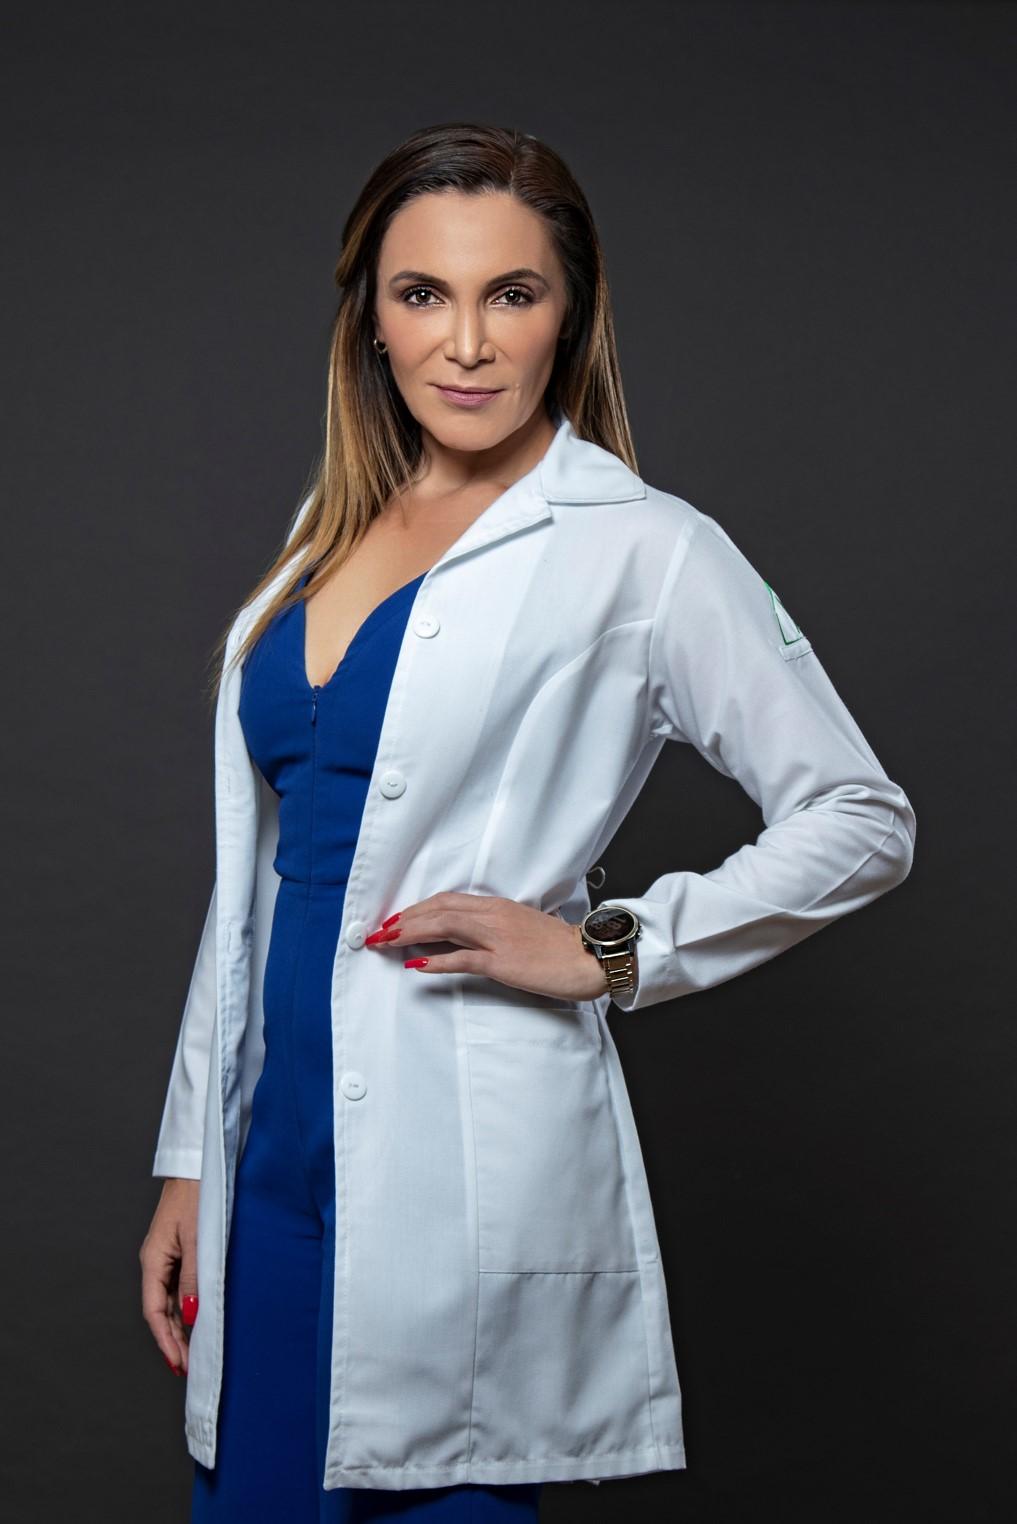 Mtra. Elizabeth Reyes Castillo